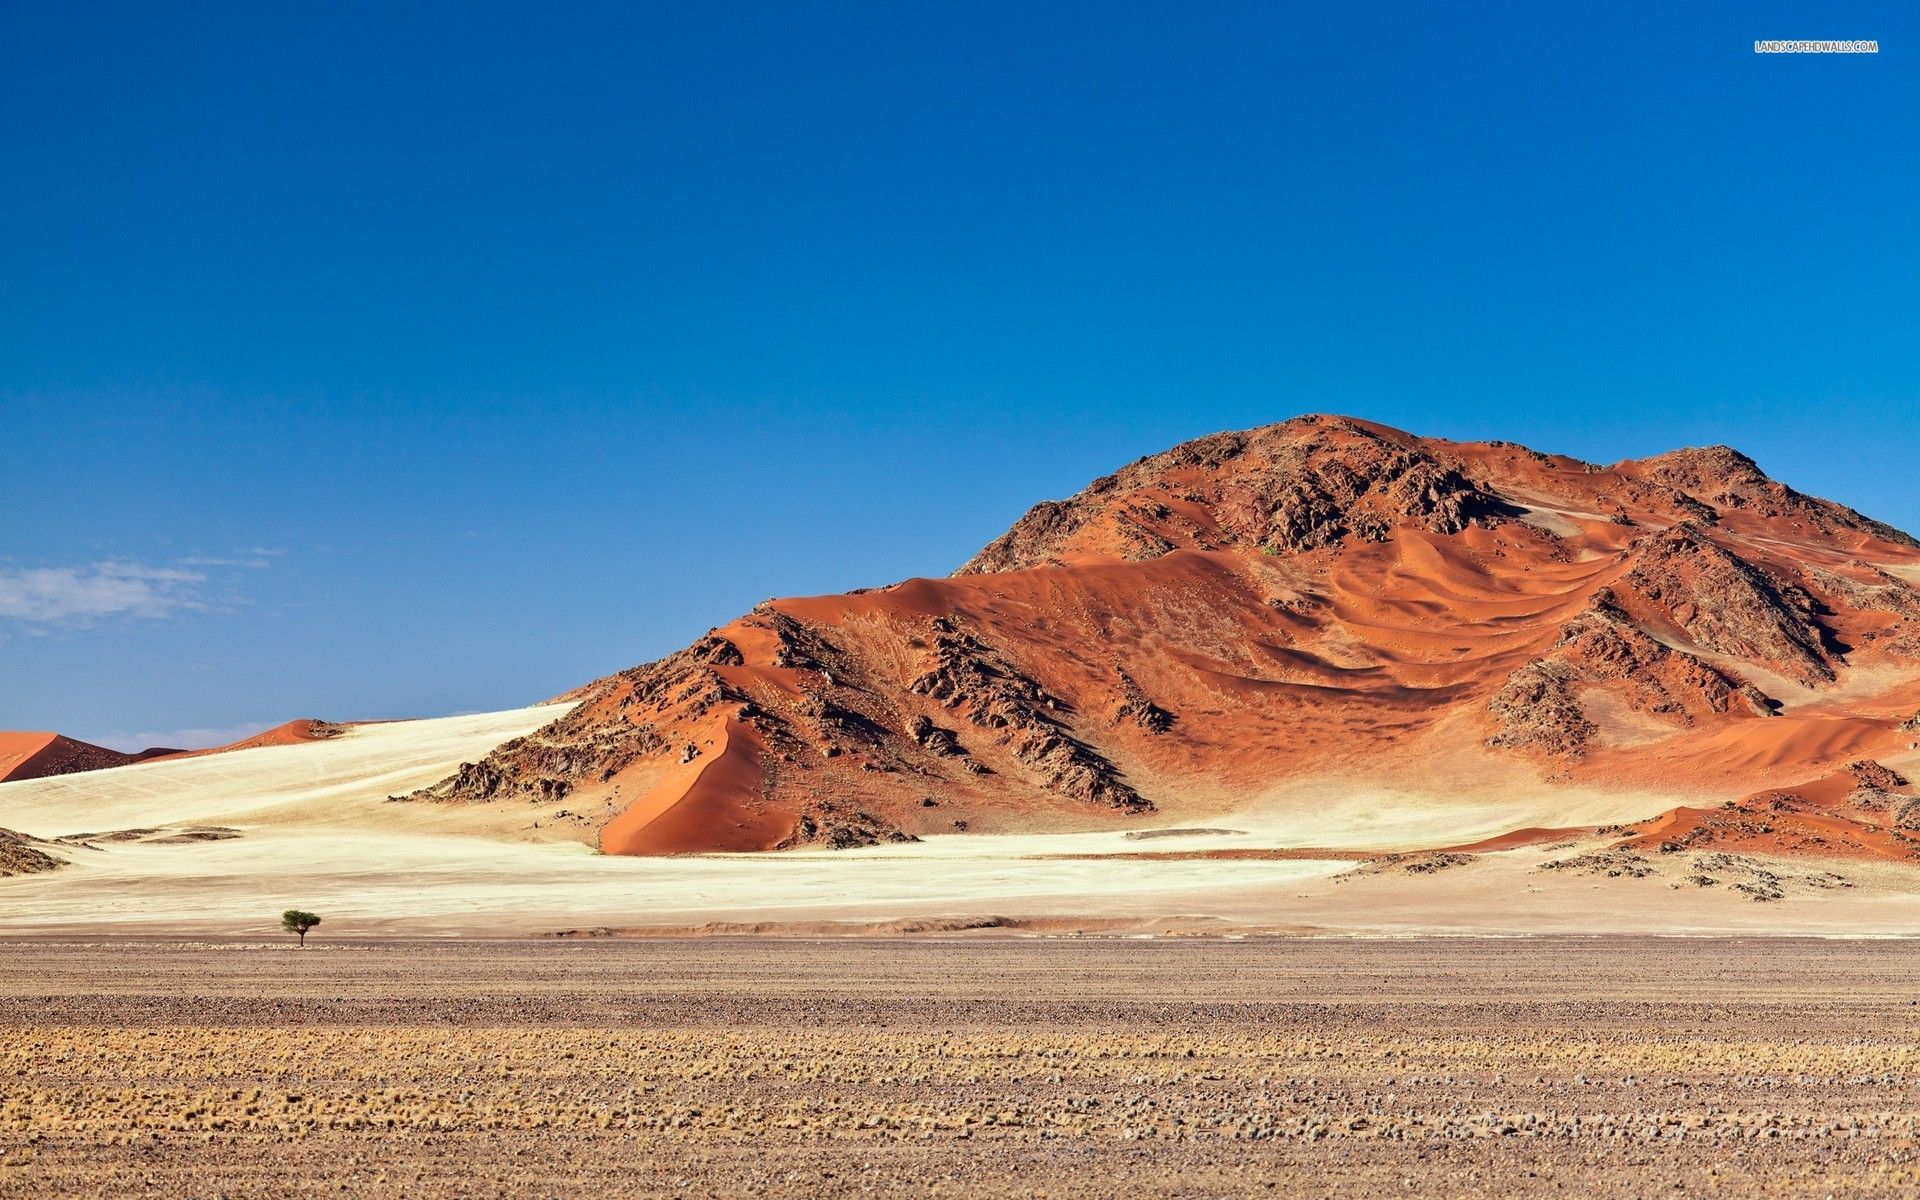 Desert Mountains Desert Mountain Wallpaper 441 Hd Landscape Nature Desktop Wallpaper Namib Desert